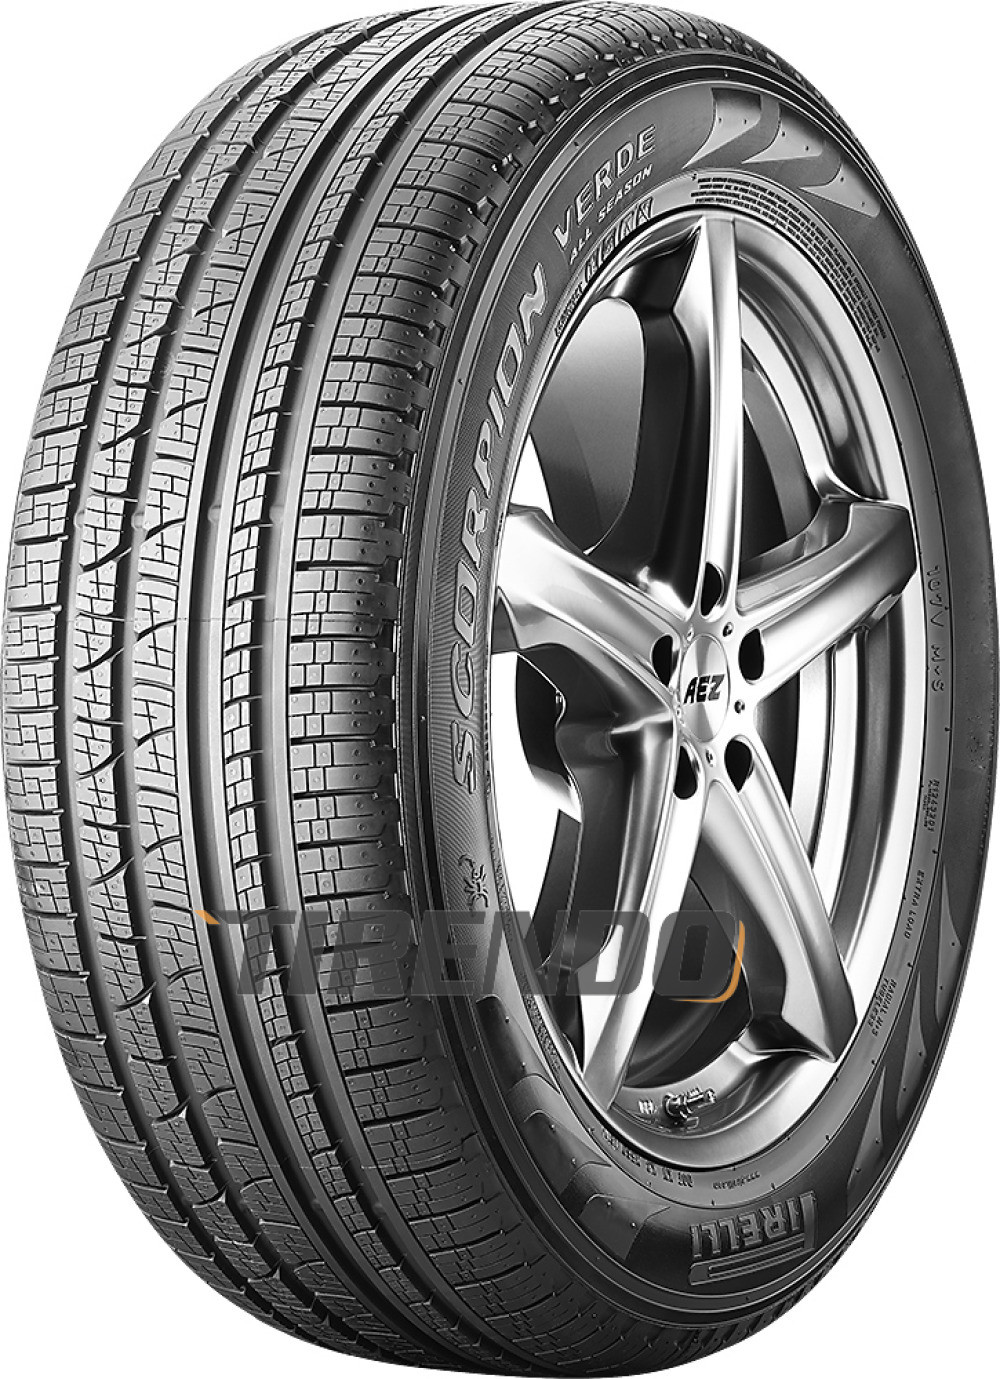 Pirelli Scorpion Verde All-Season 235/60R16 100H